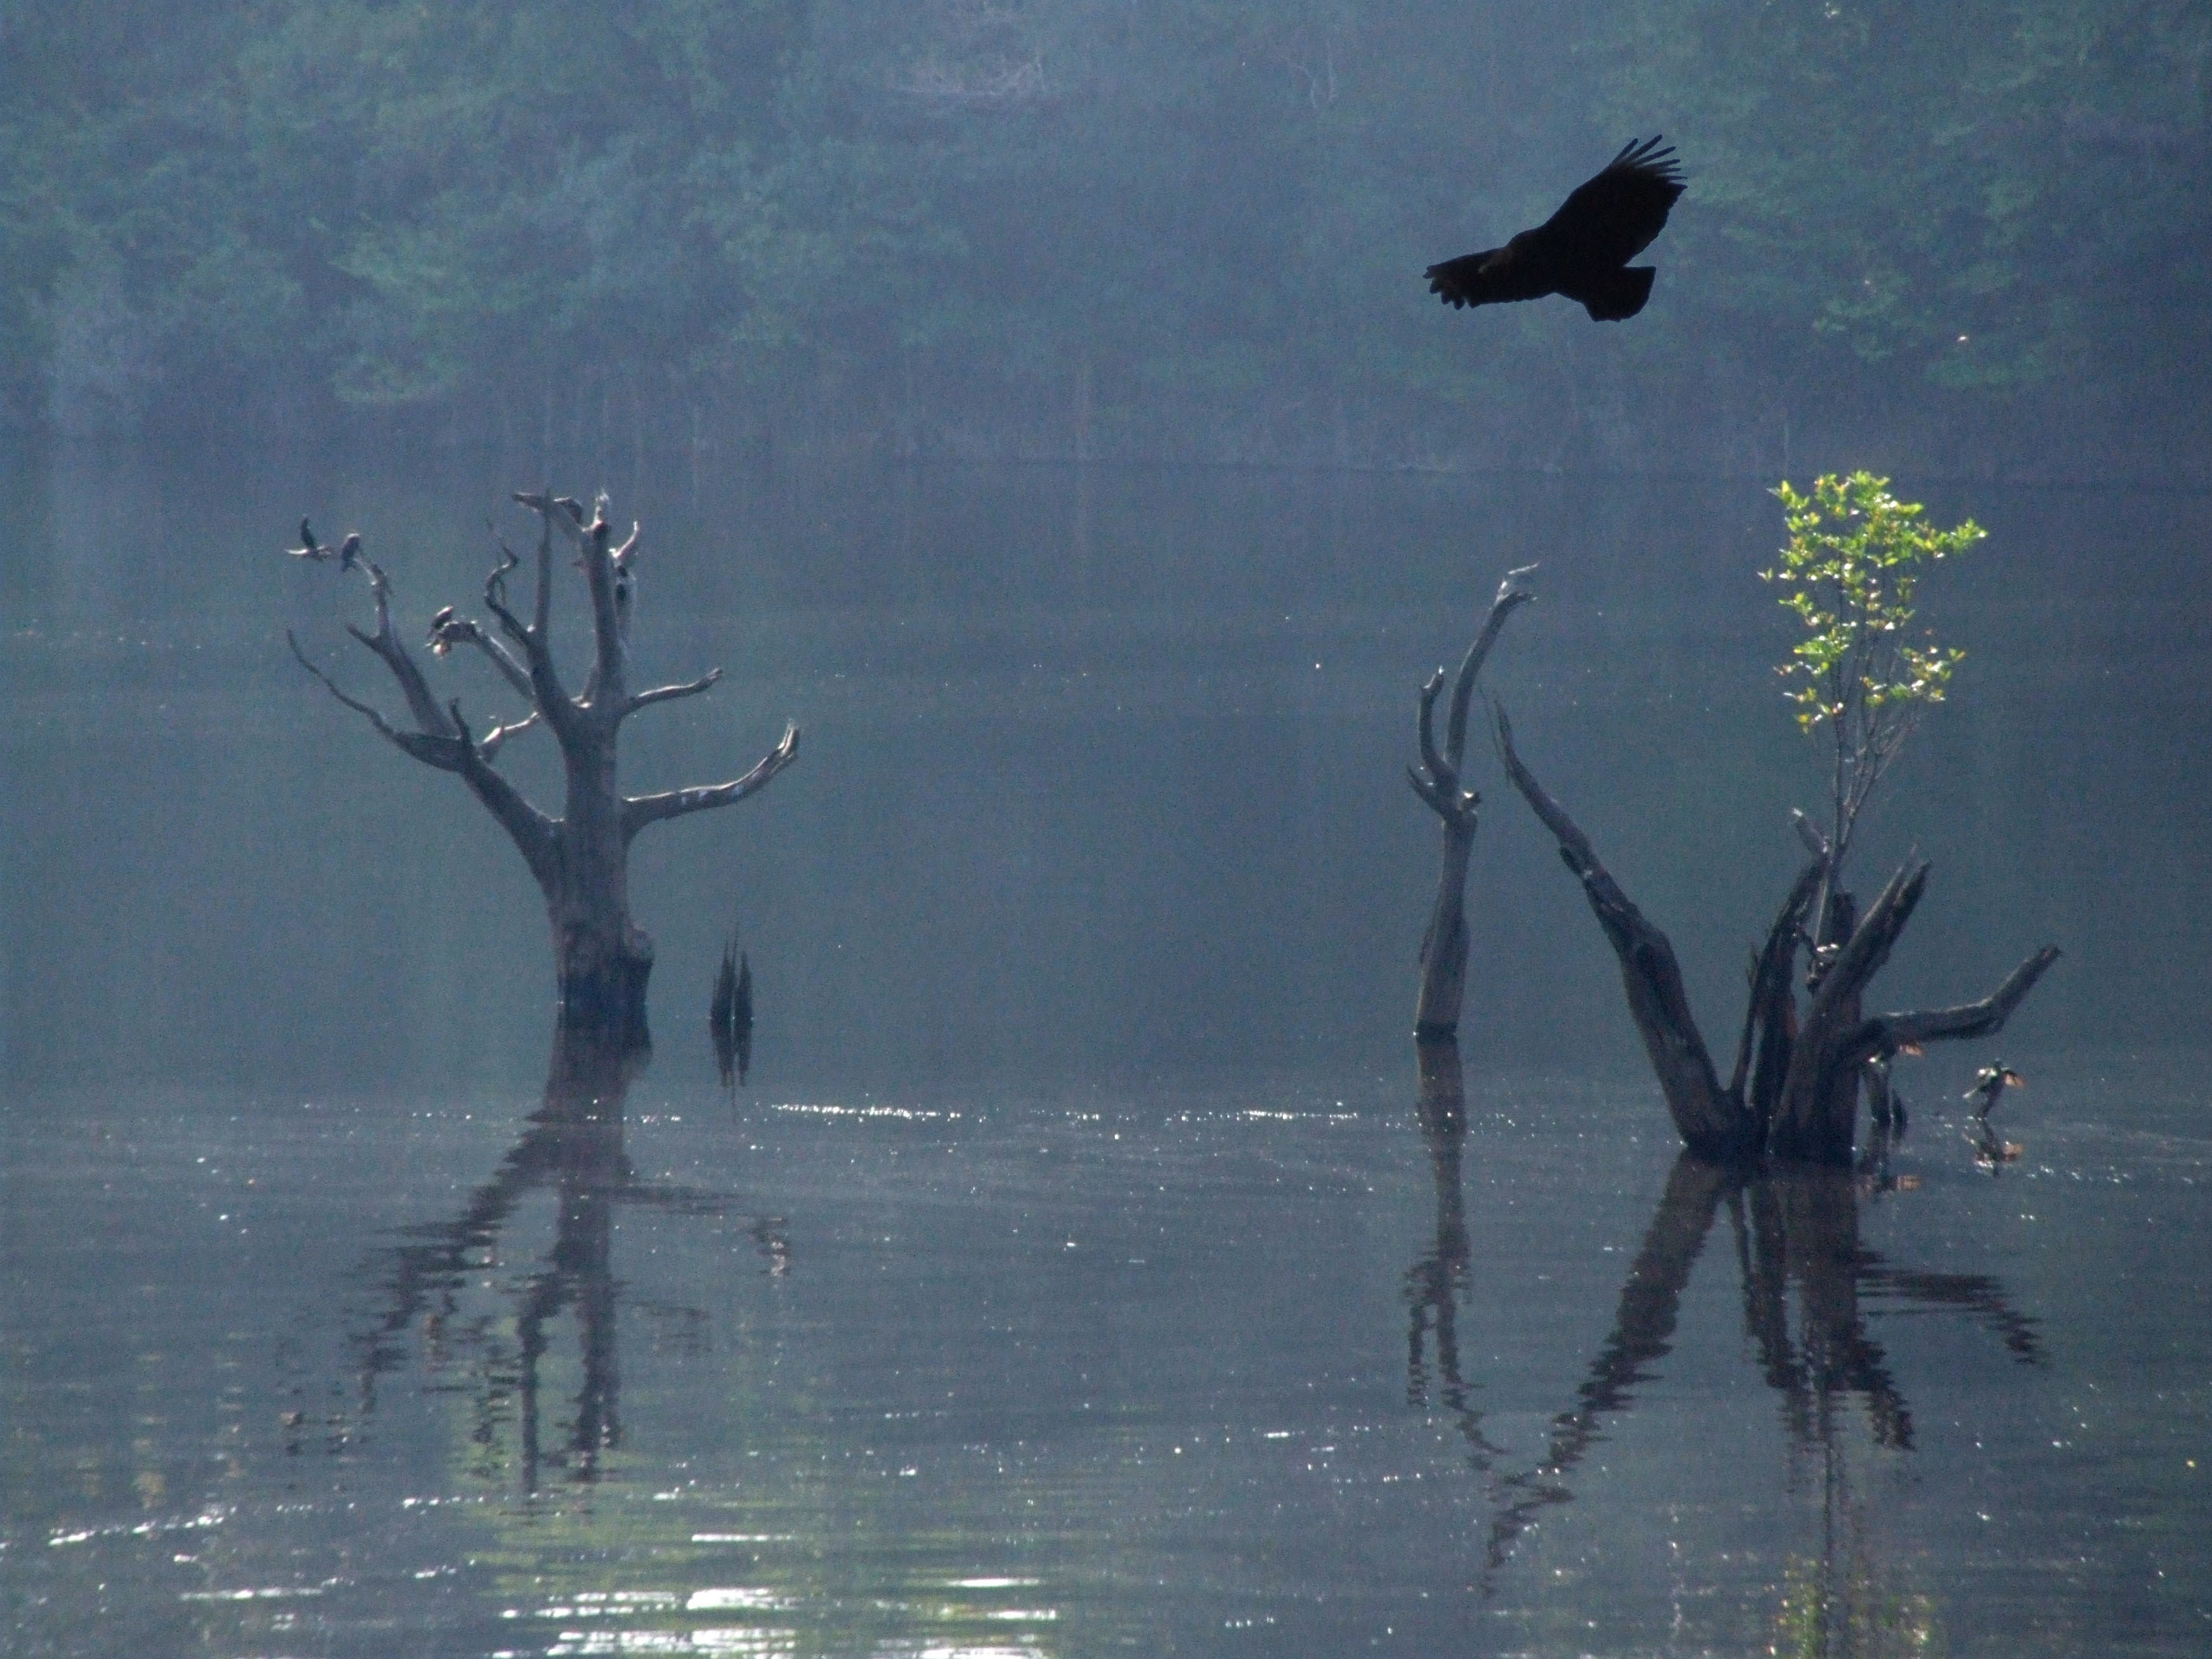 The flooding Amazon